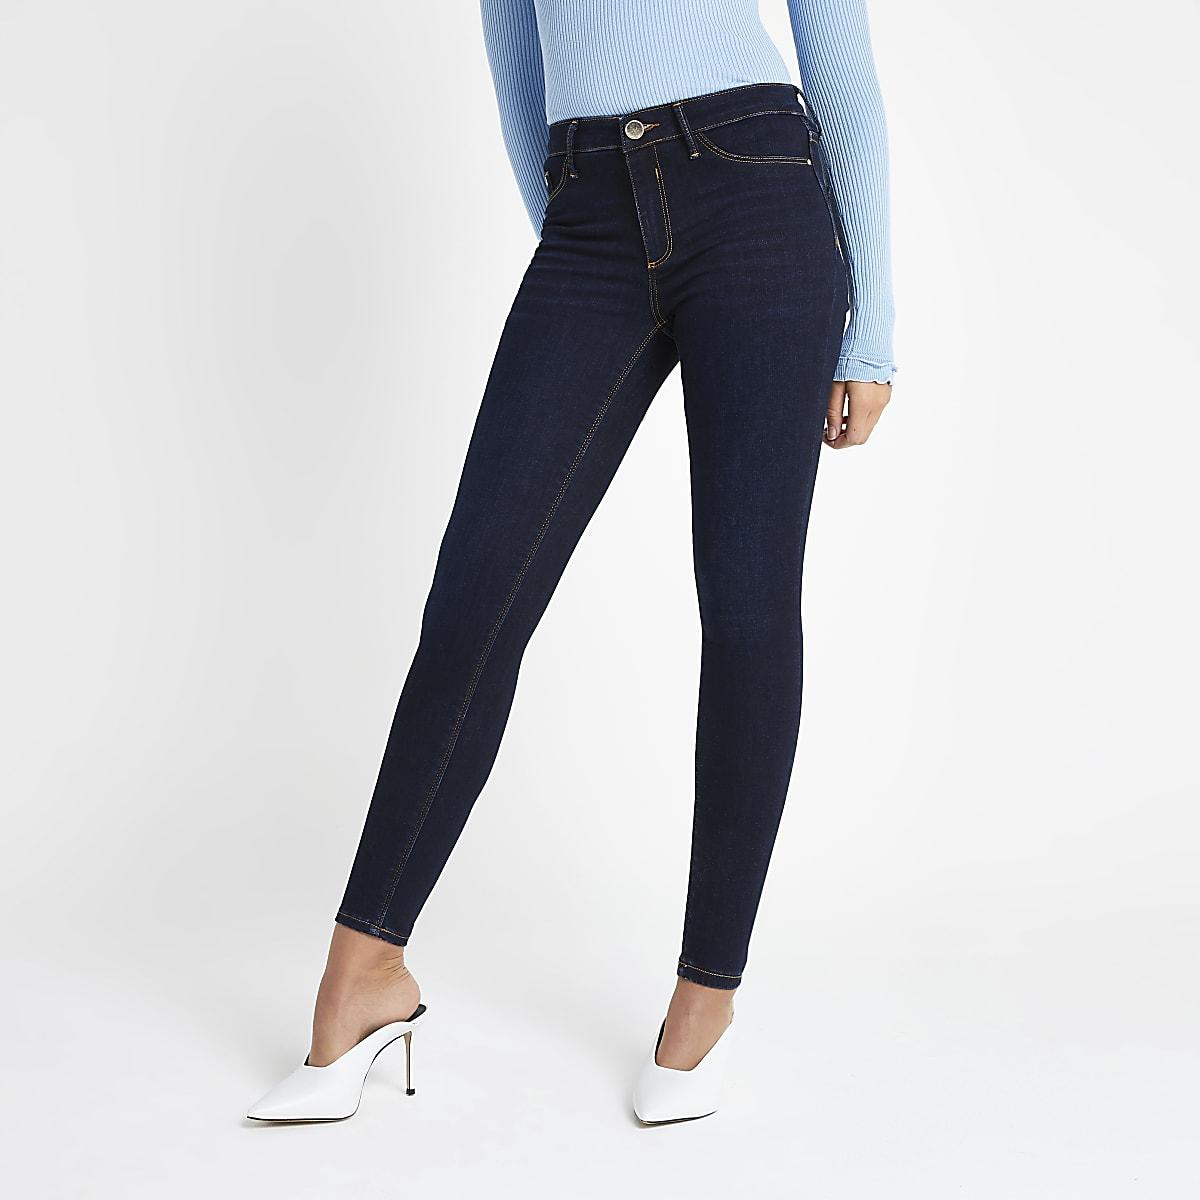 3c10fb41aa1f6 Dark blue Molly mid rise jeggings - Jeggings - Jeans - women